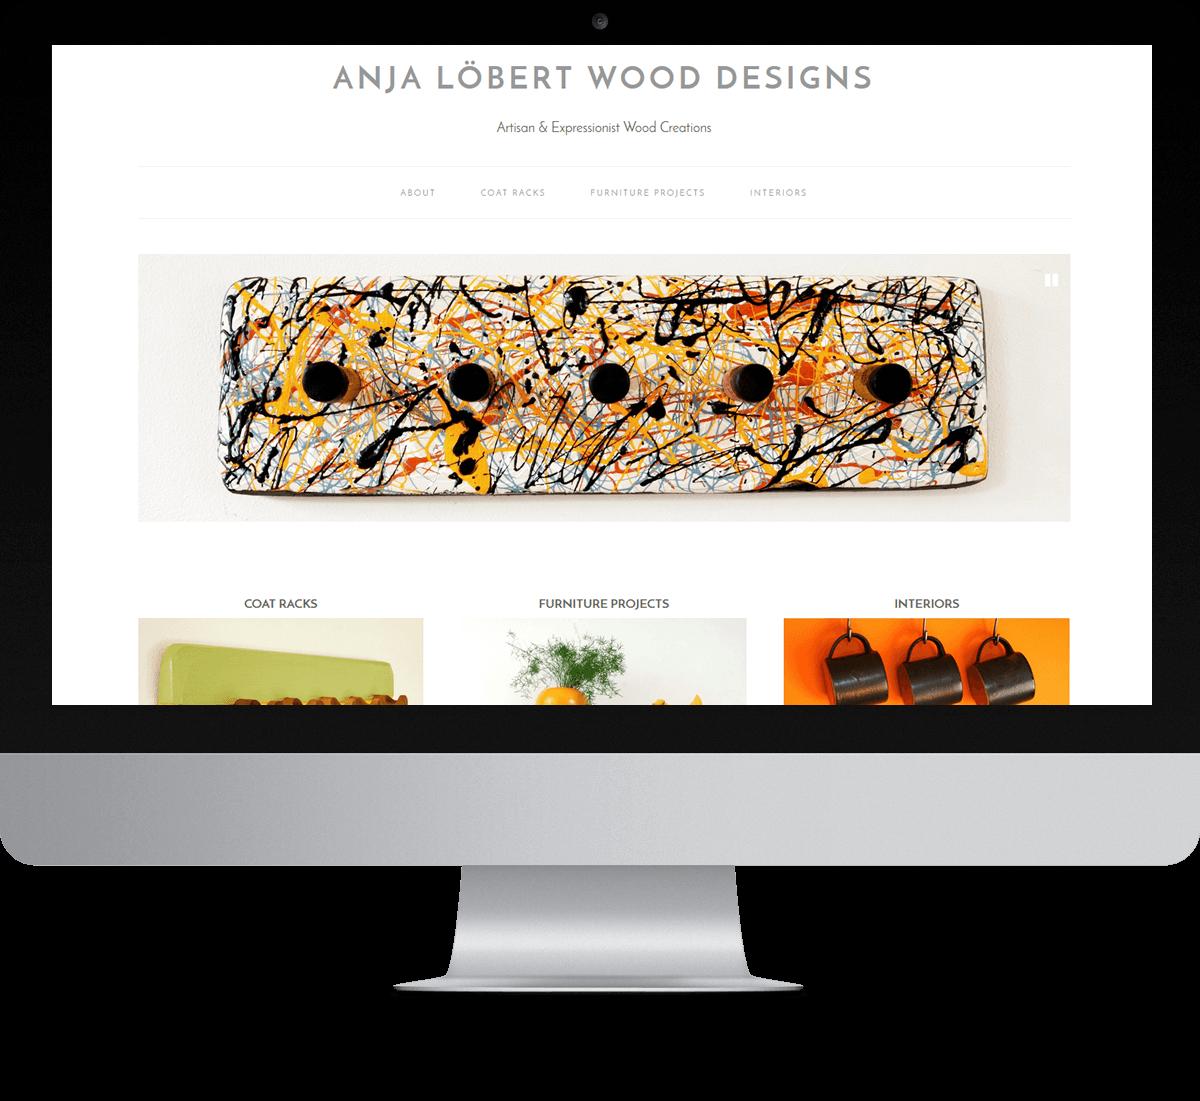 Anja Lobert Wood Designs website